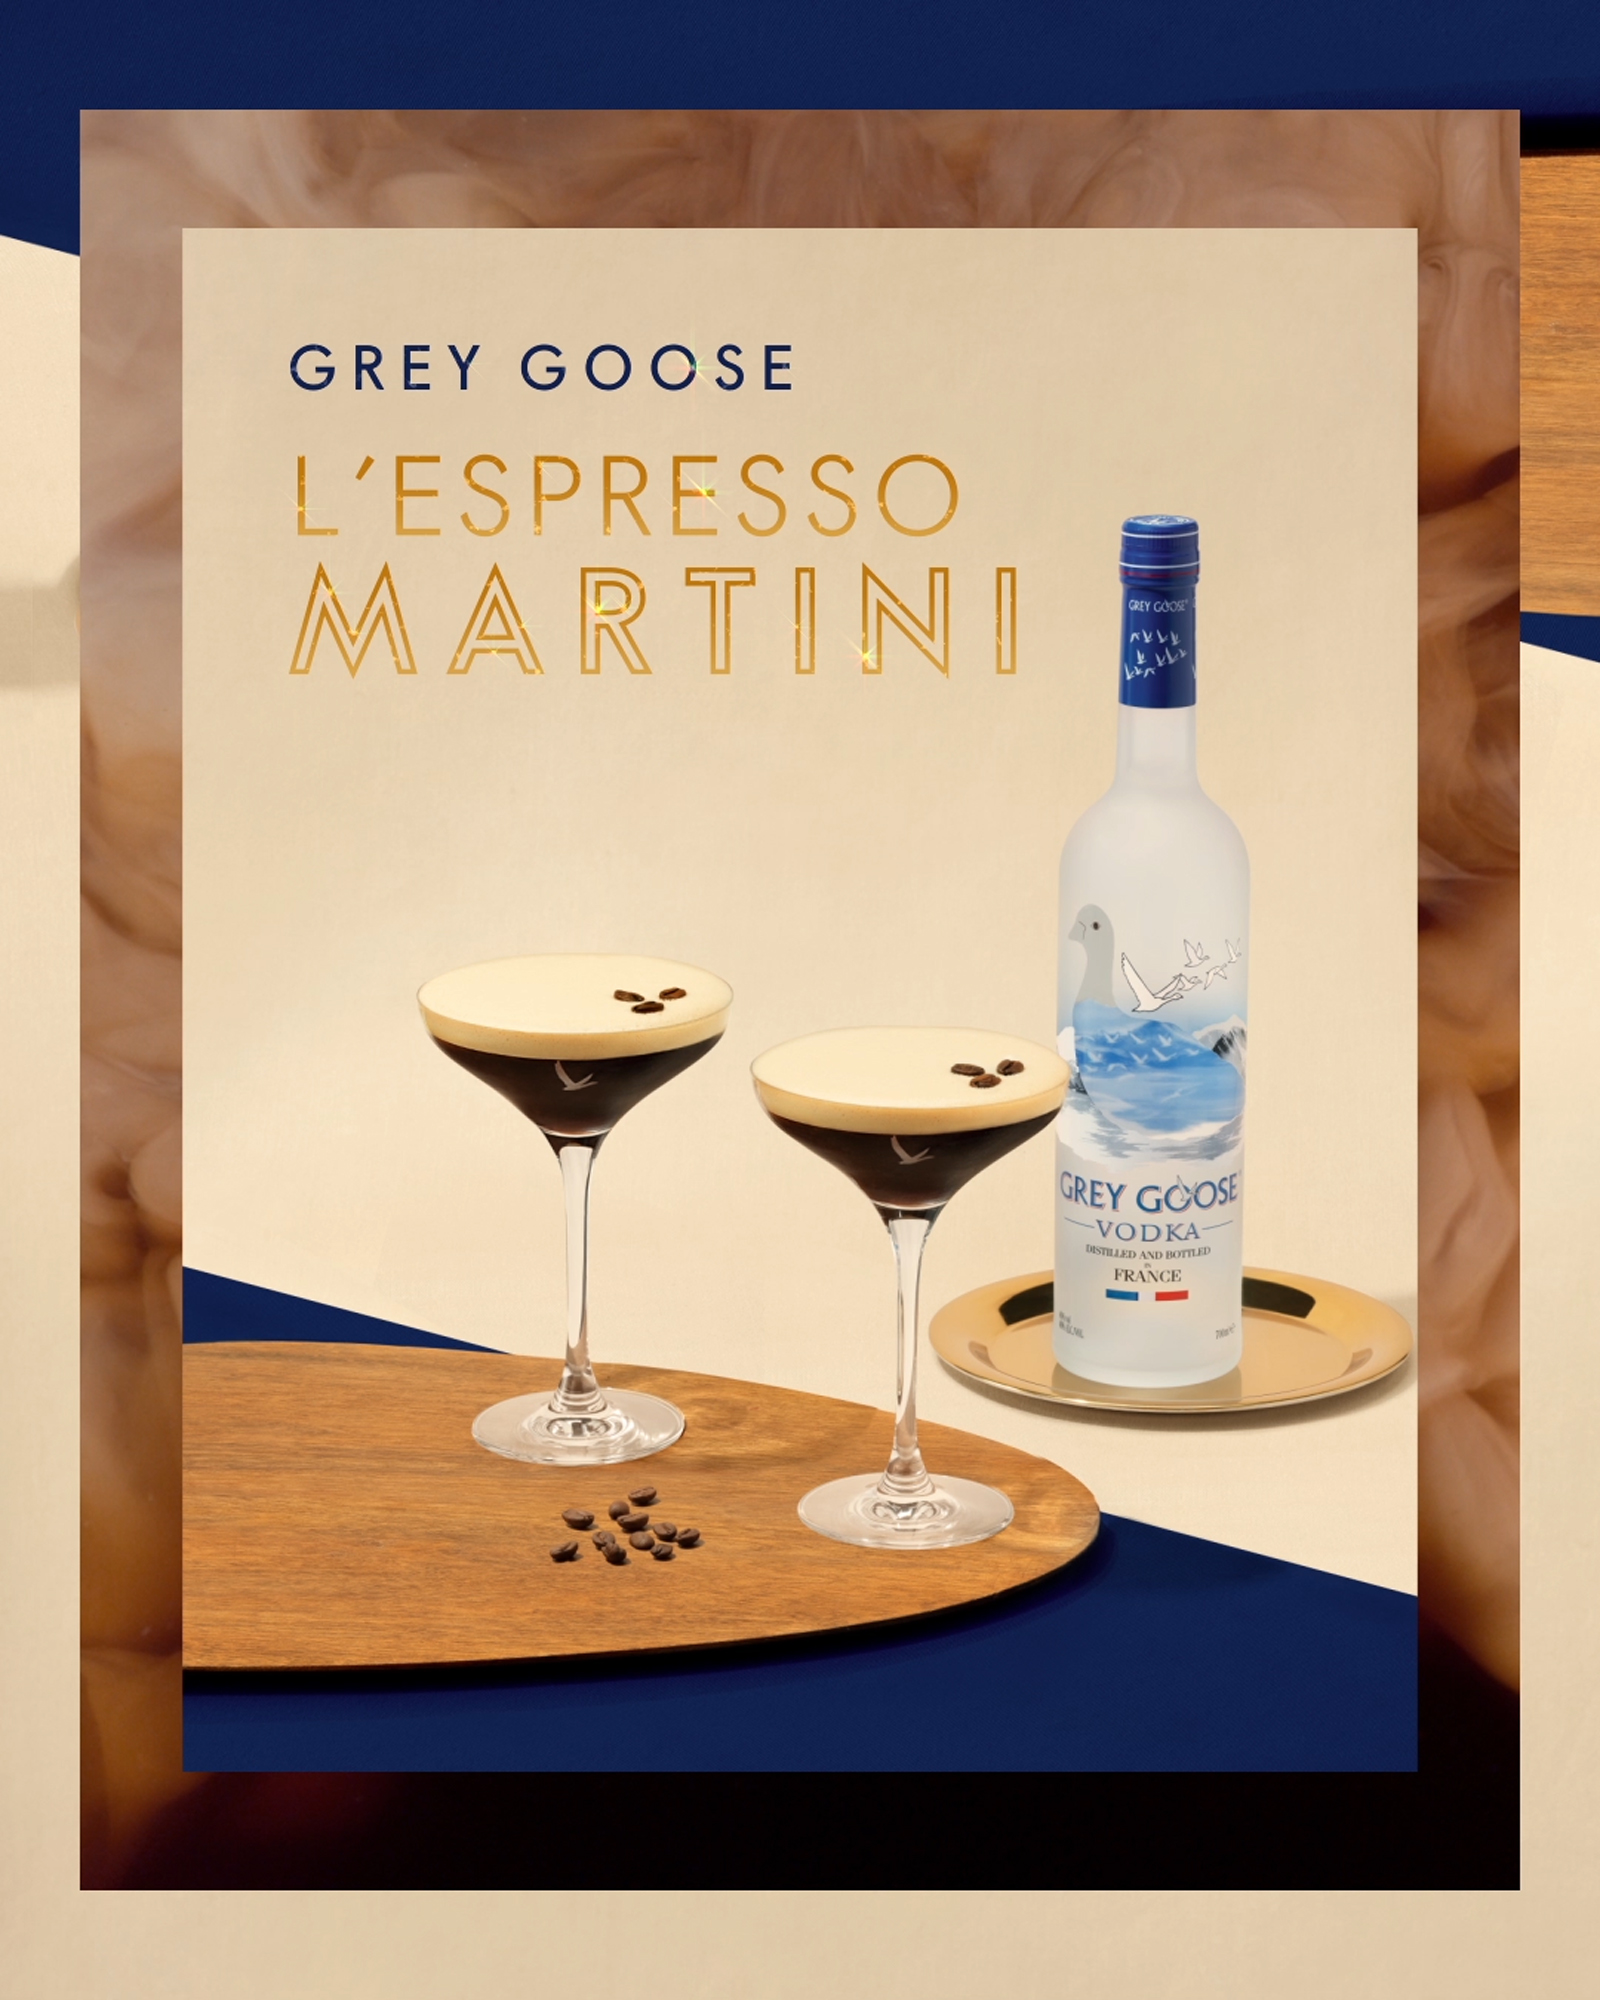 GreyGoose-L'EspressoMartini_portrait.jpg